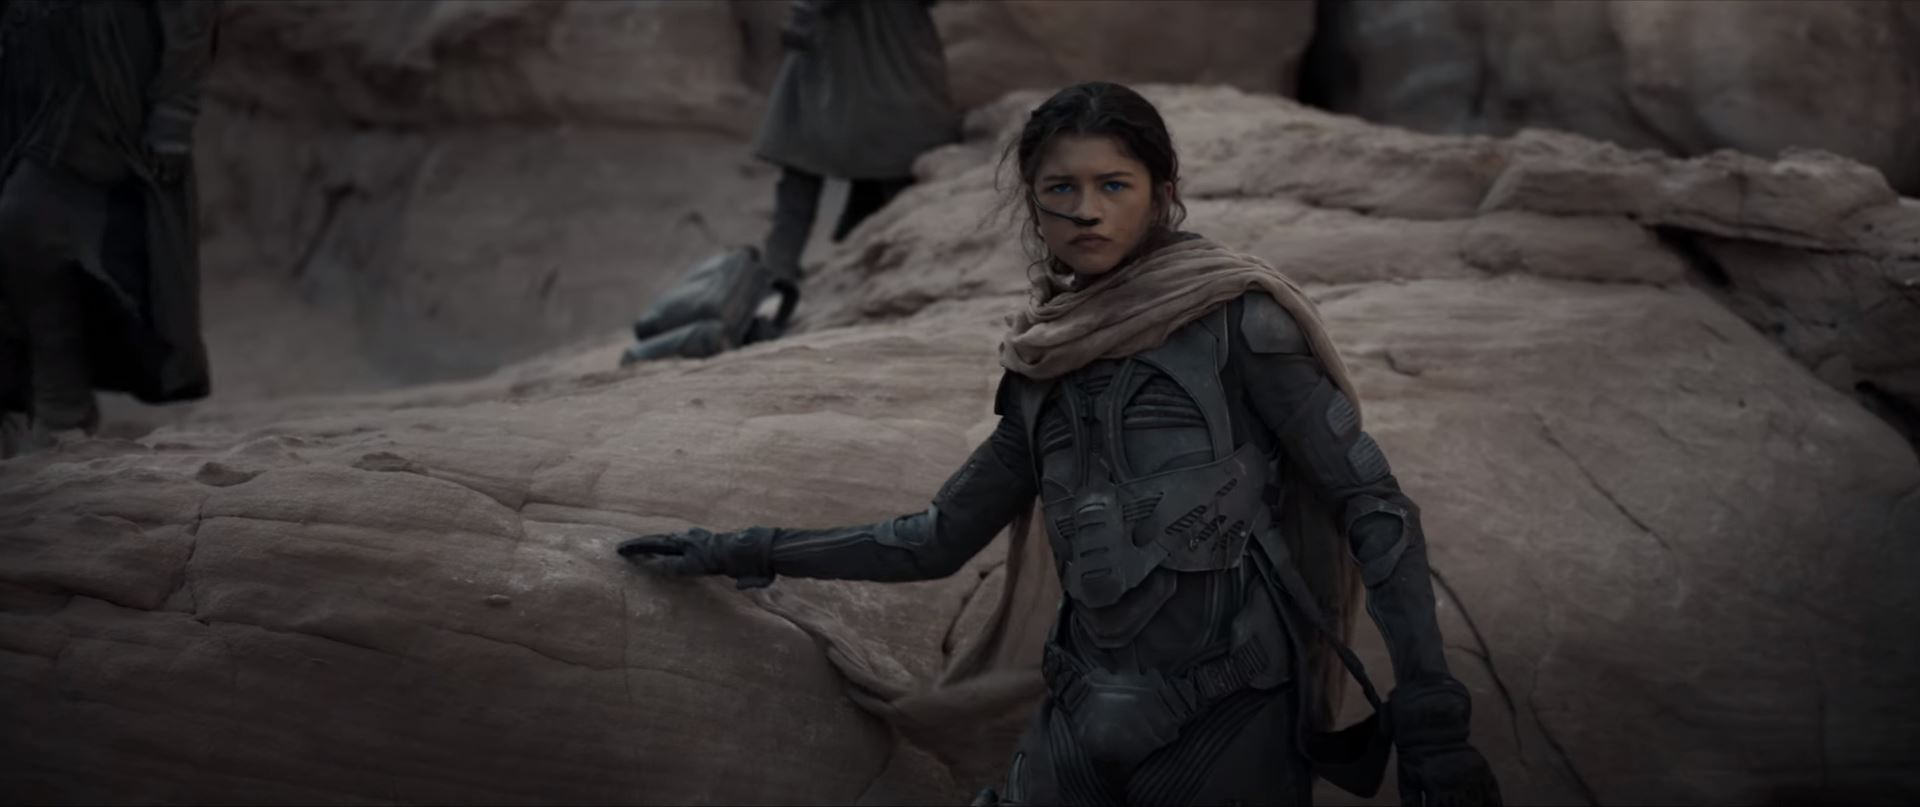 Dune movie trailer Zendaya as Chani